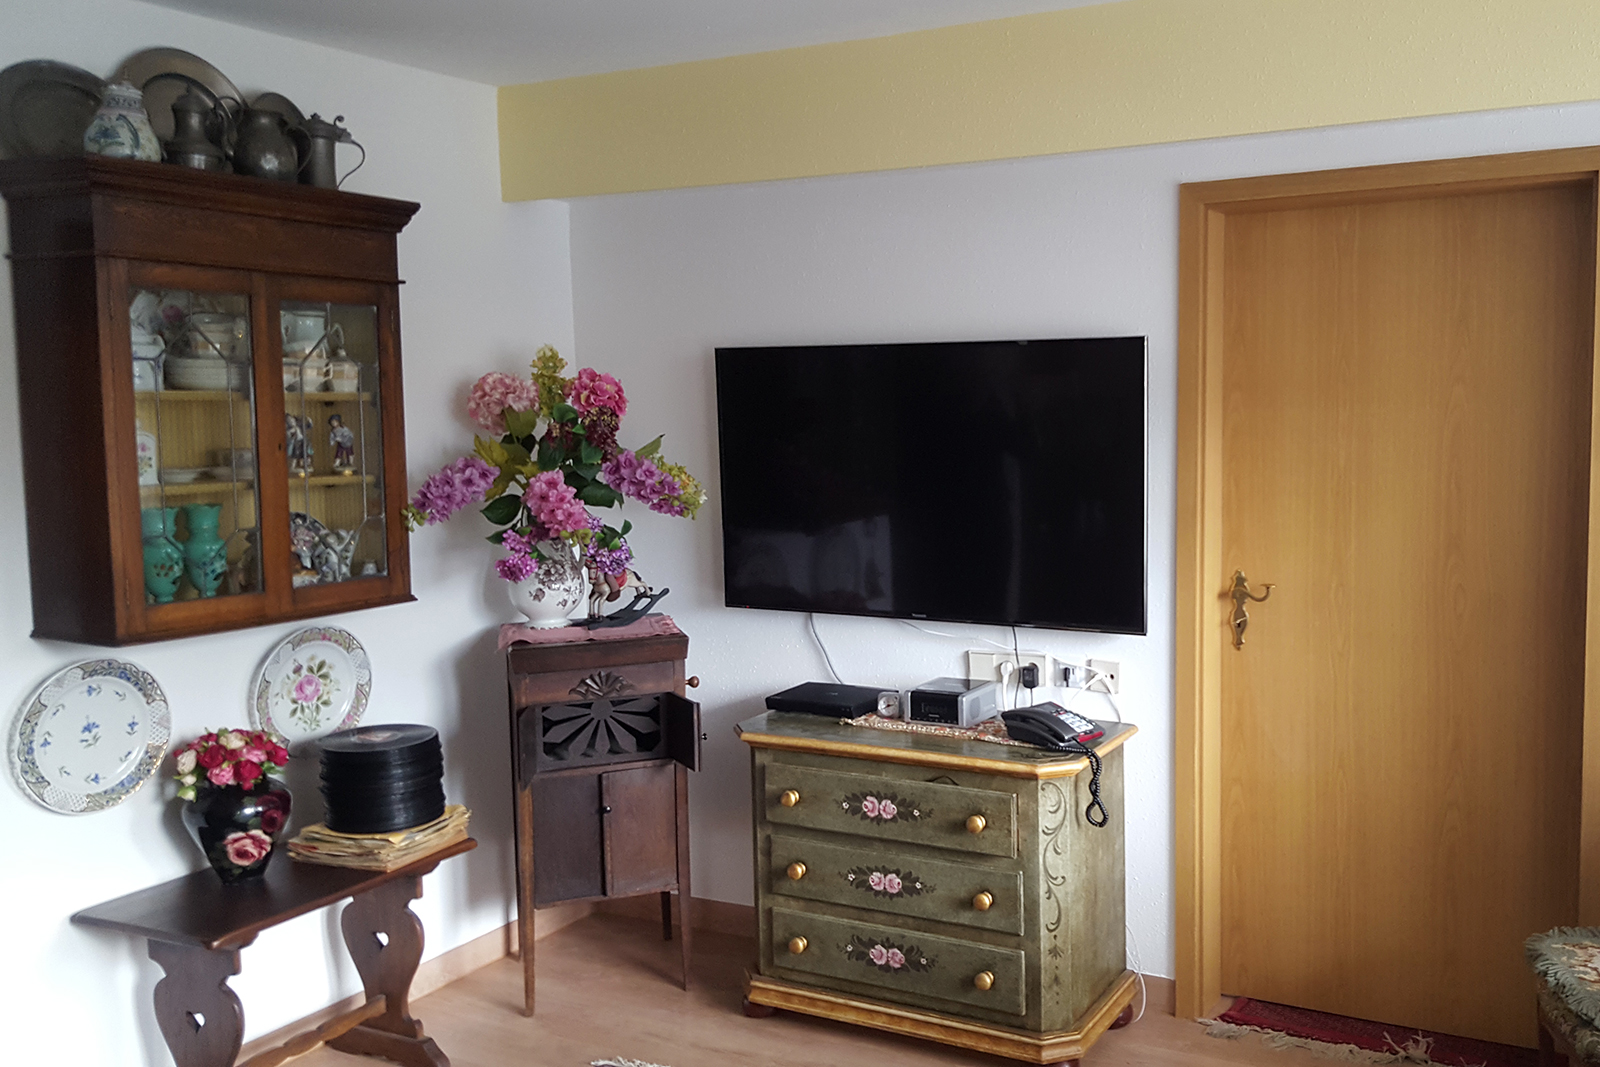 apartments herzogin luisen residenz. Black Bedroom Furniture Sets. Home Design Ideas